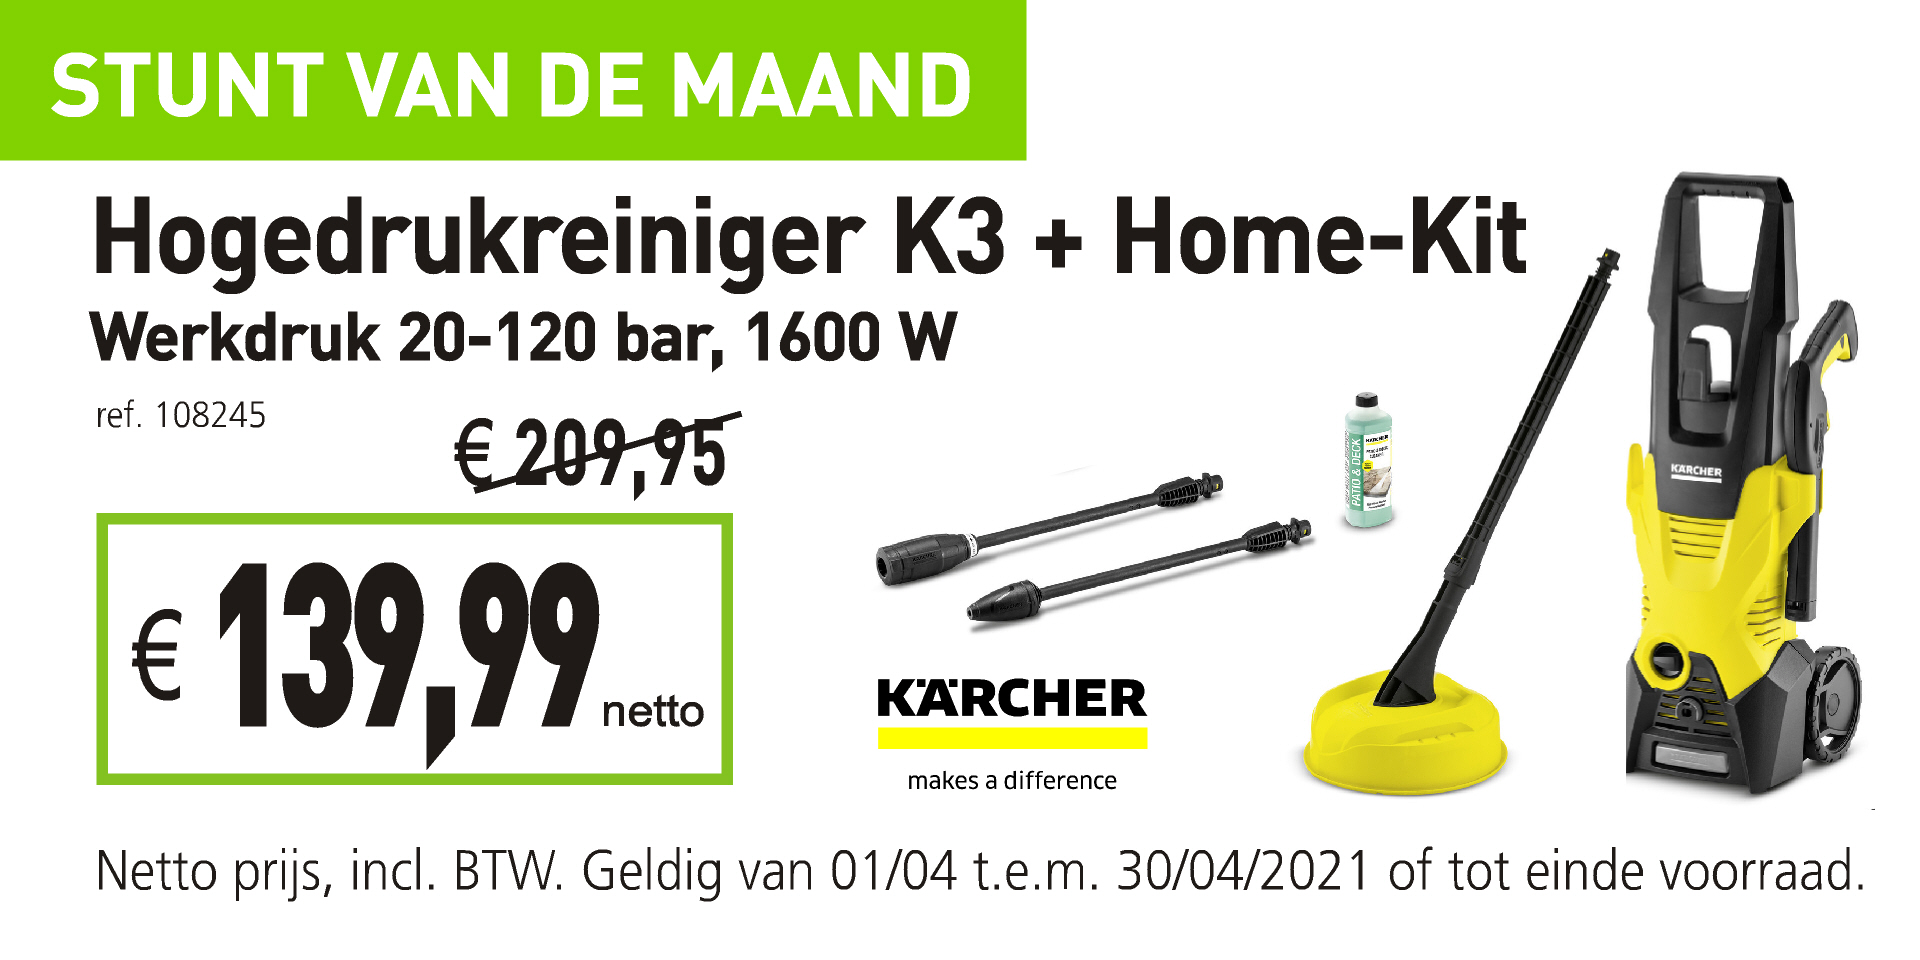 Stunt april hogedrukreiniger K3 Karcher + home kit